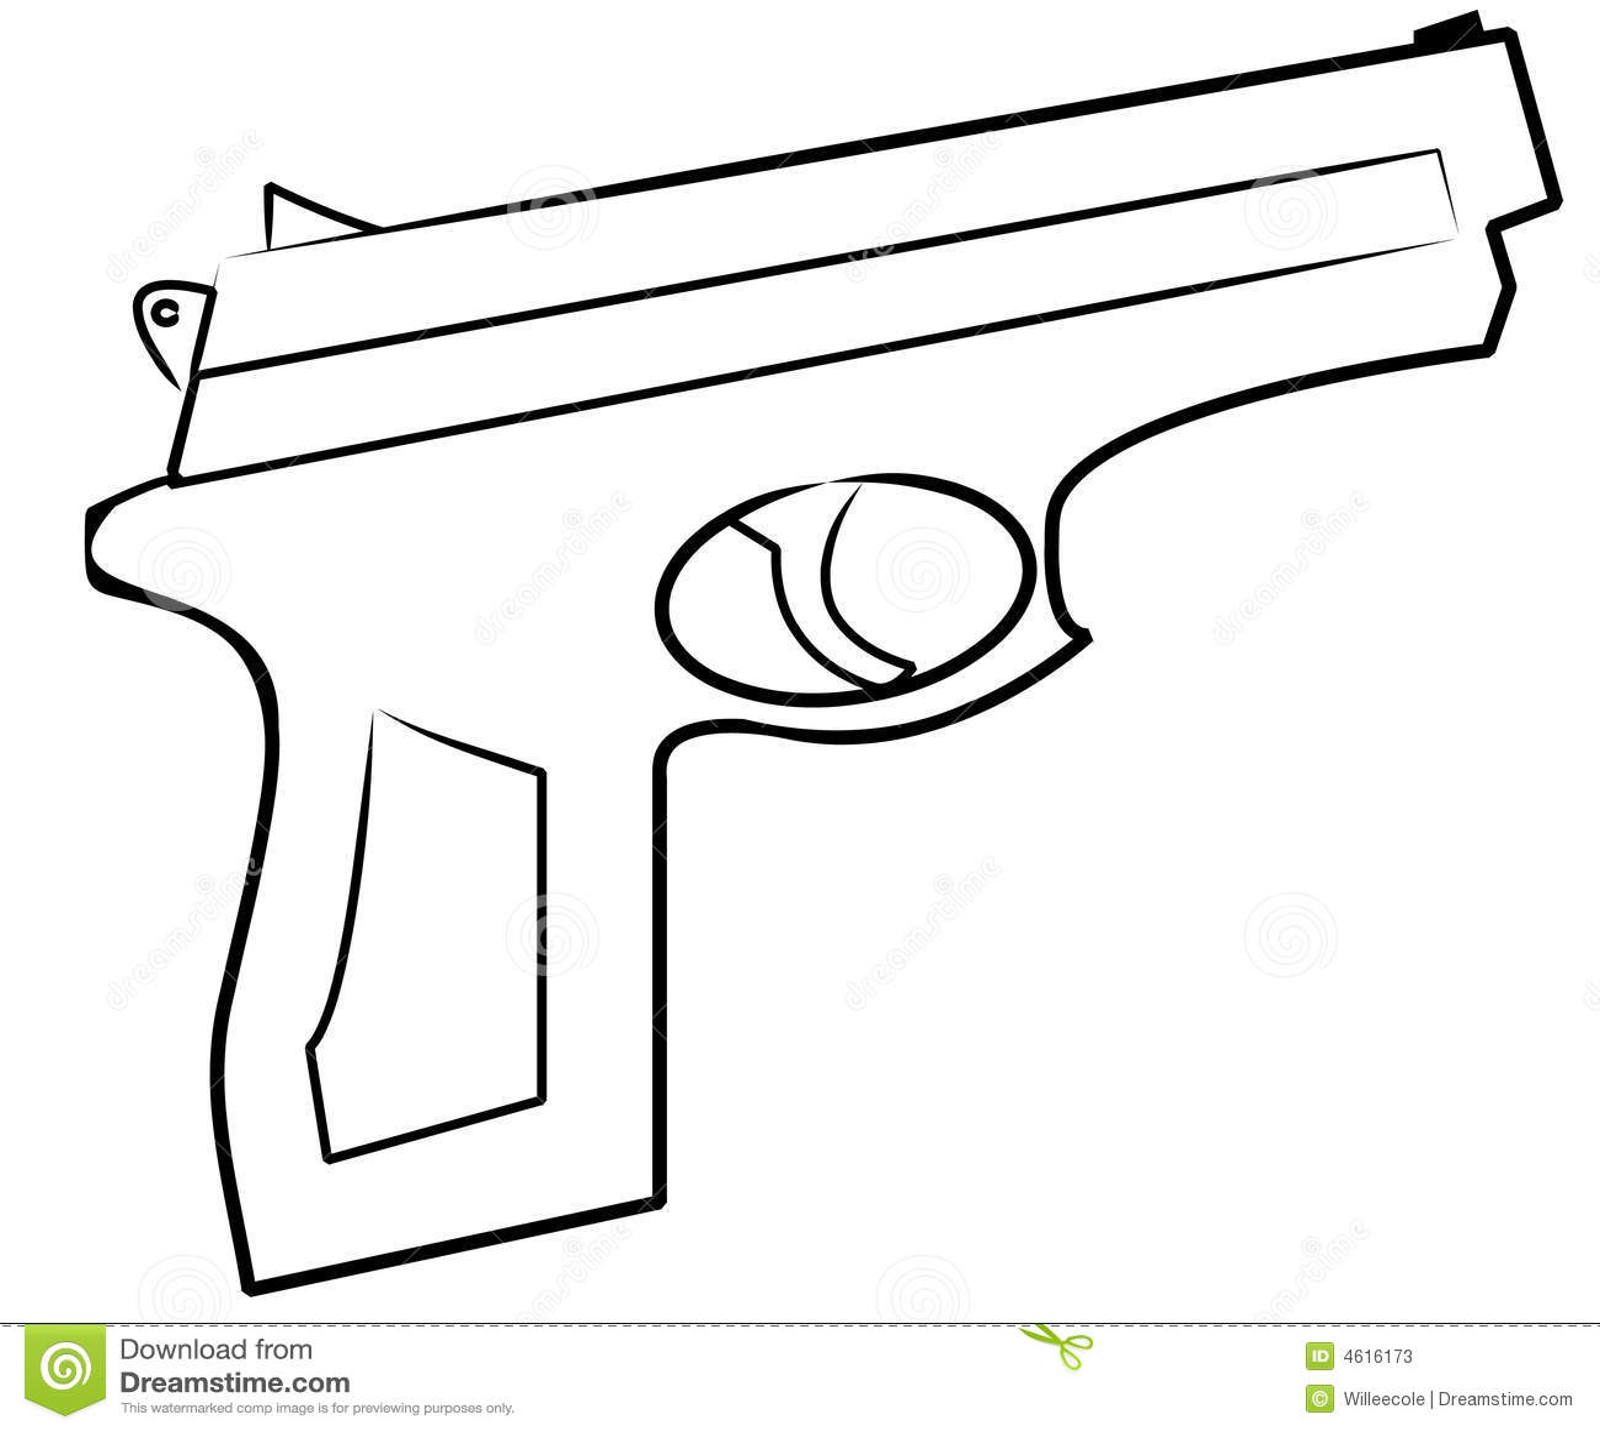 Outline of hand gun isolated on white - vector.